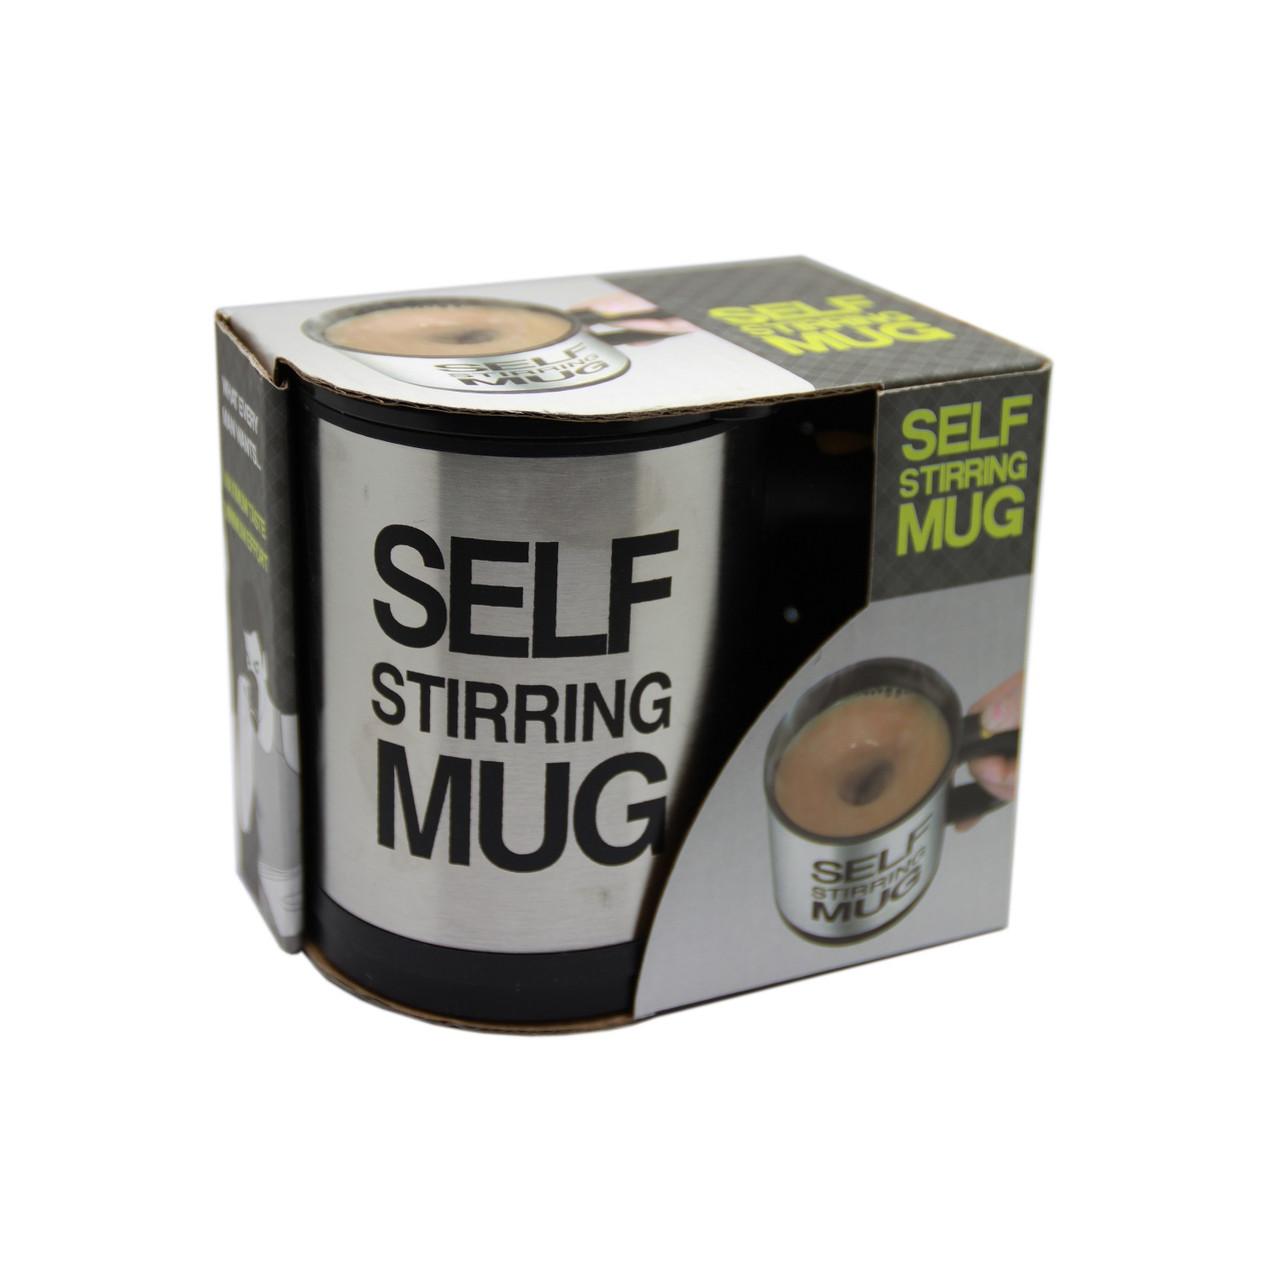 Кружка с автоматическим перемешиванием Self Stirring Mug